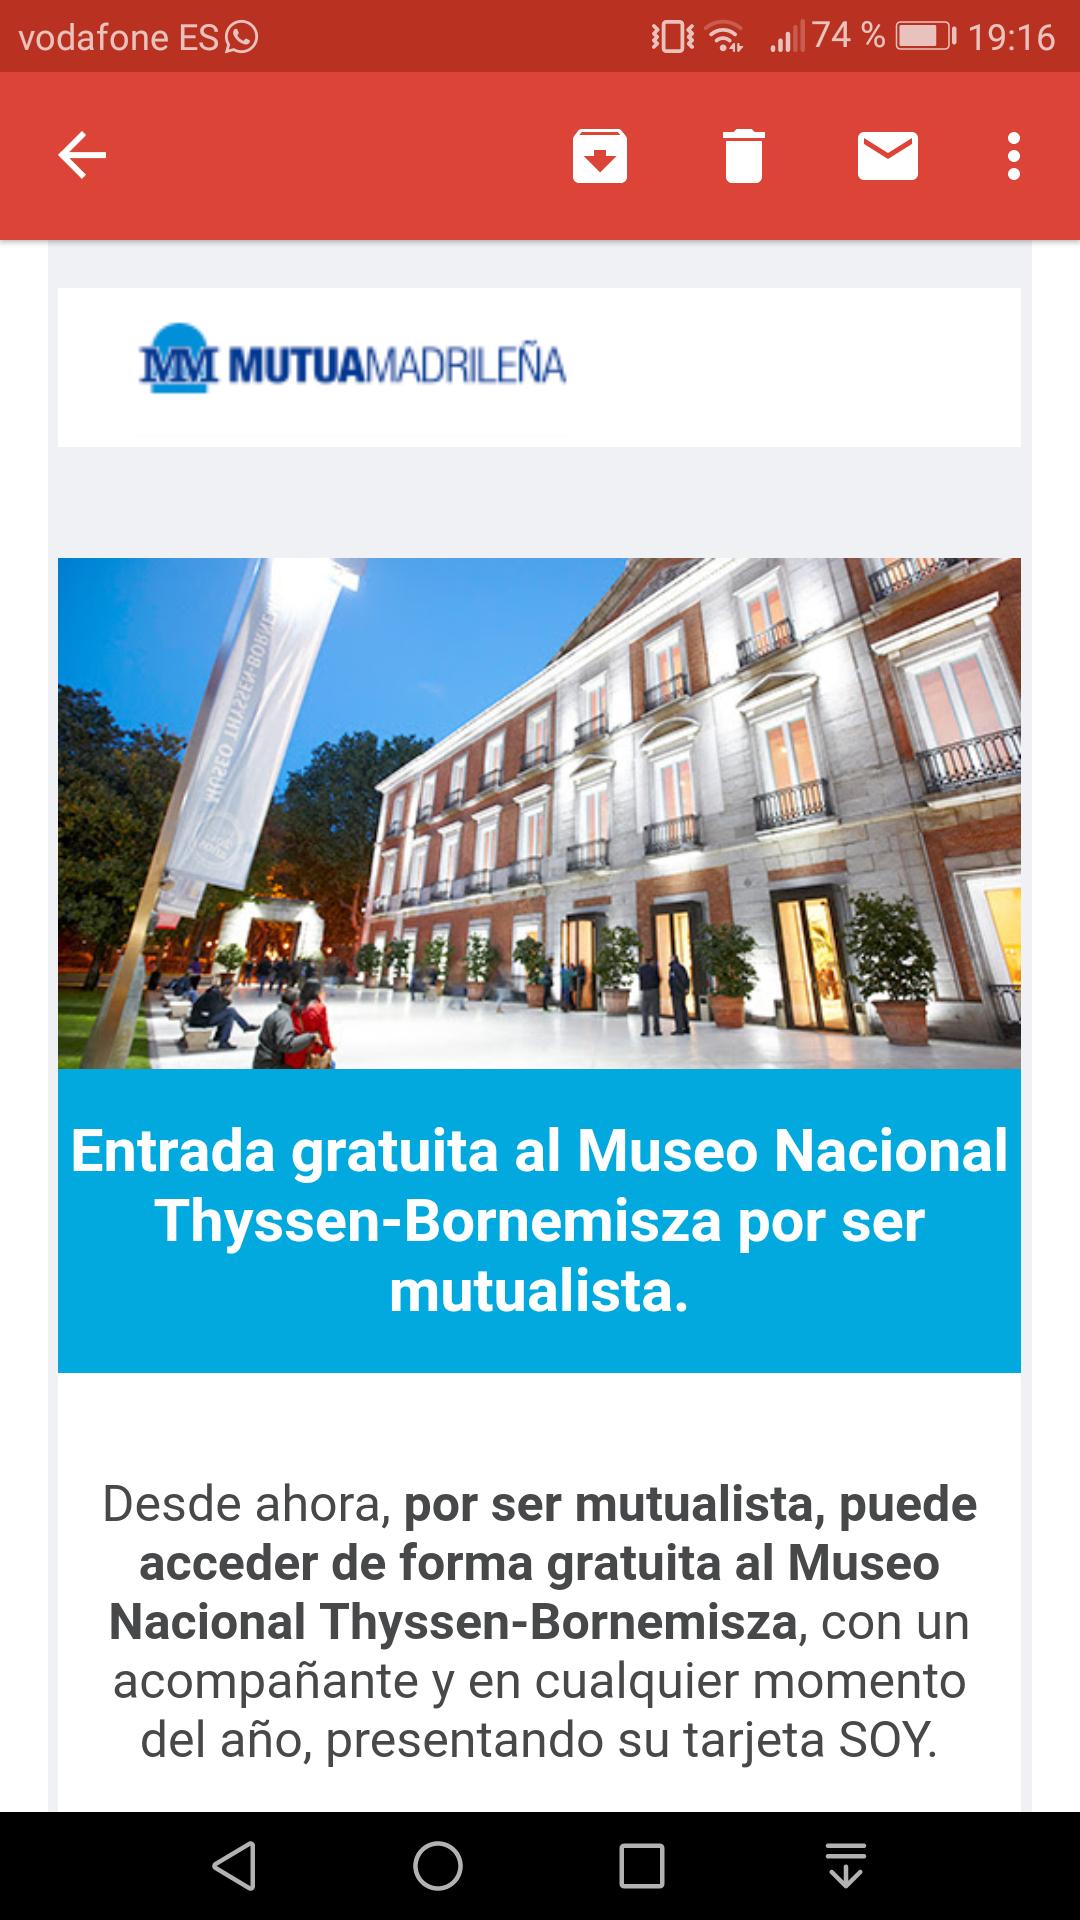 Entrada gratuita al Museo Nacional Thyssen-Bornemisza por ser mutualista.